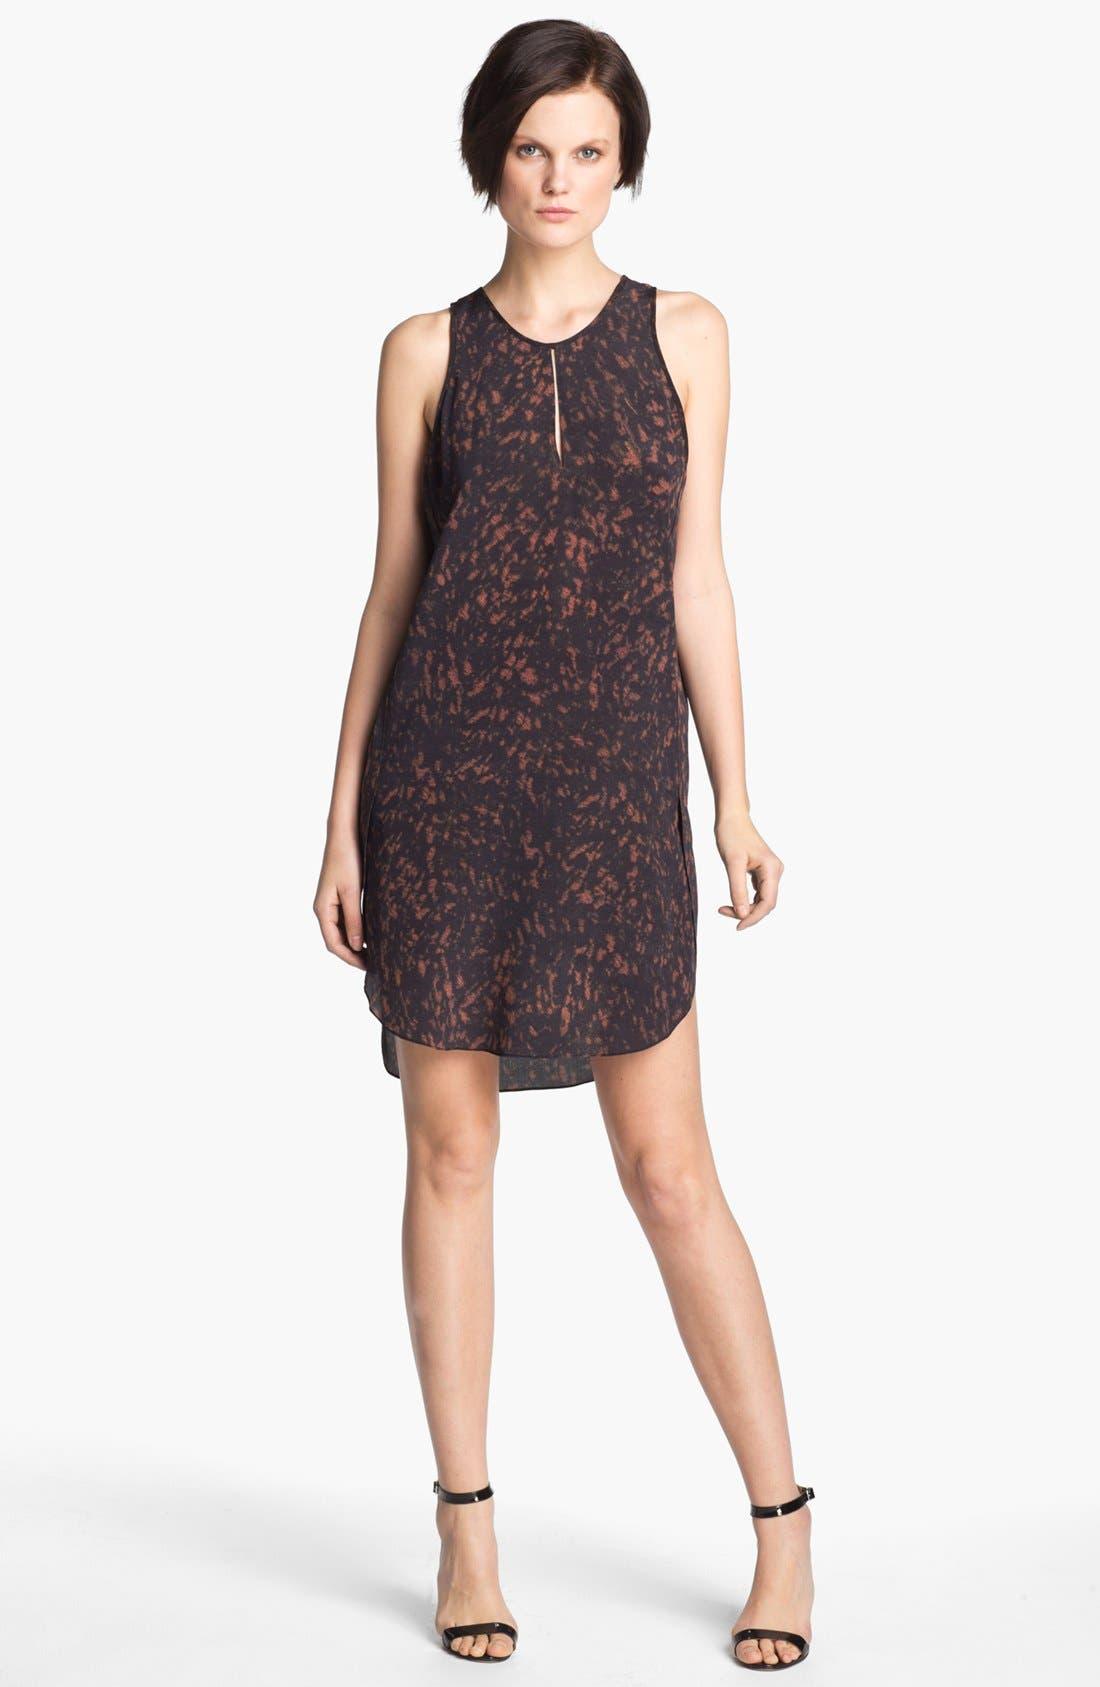 Alternate Image 1 Selected - 3.1 Phillip Lim Print Silk Tank Dress